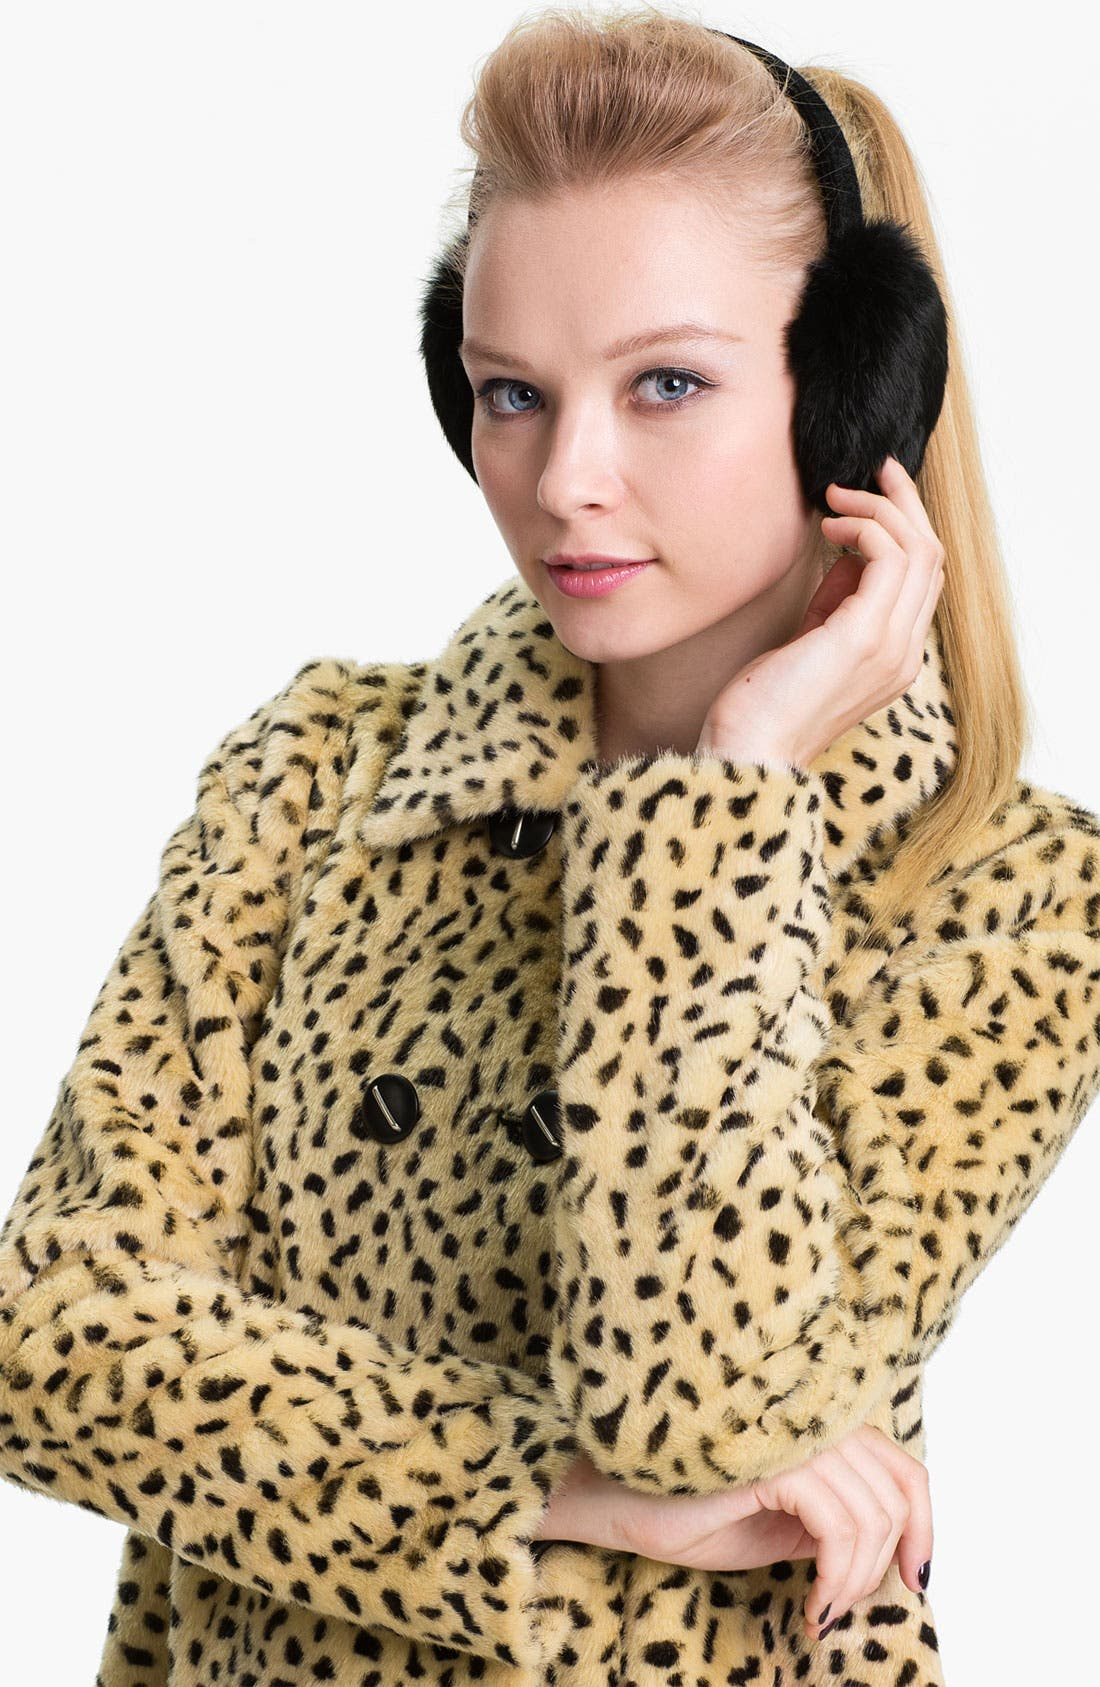 Main Image - Dena Products Genuine Rabbit Fur Earmuffs